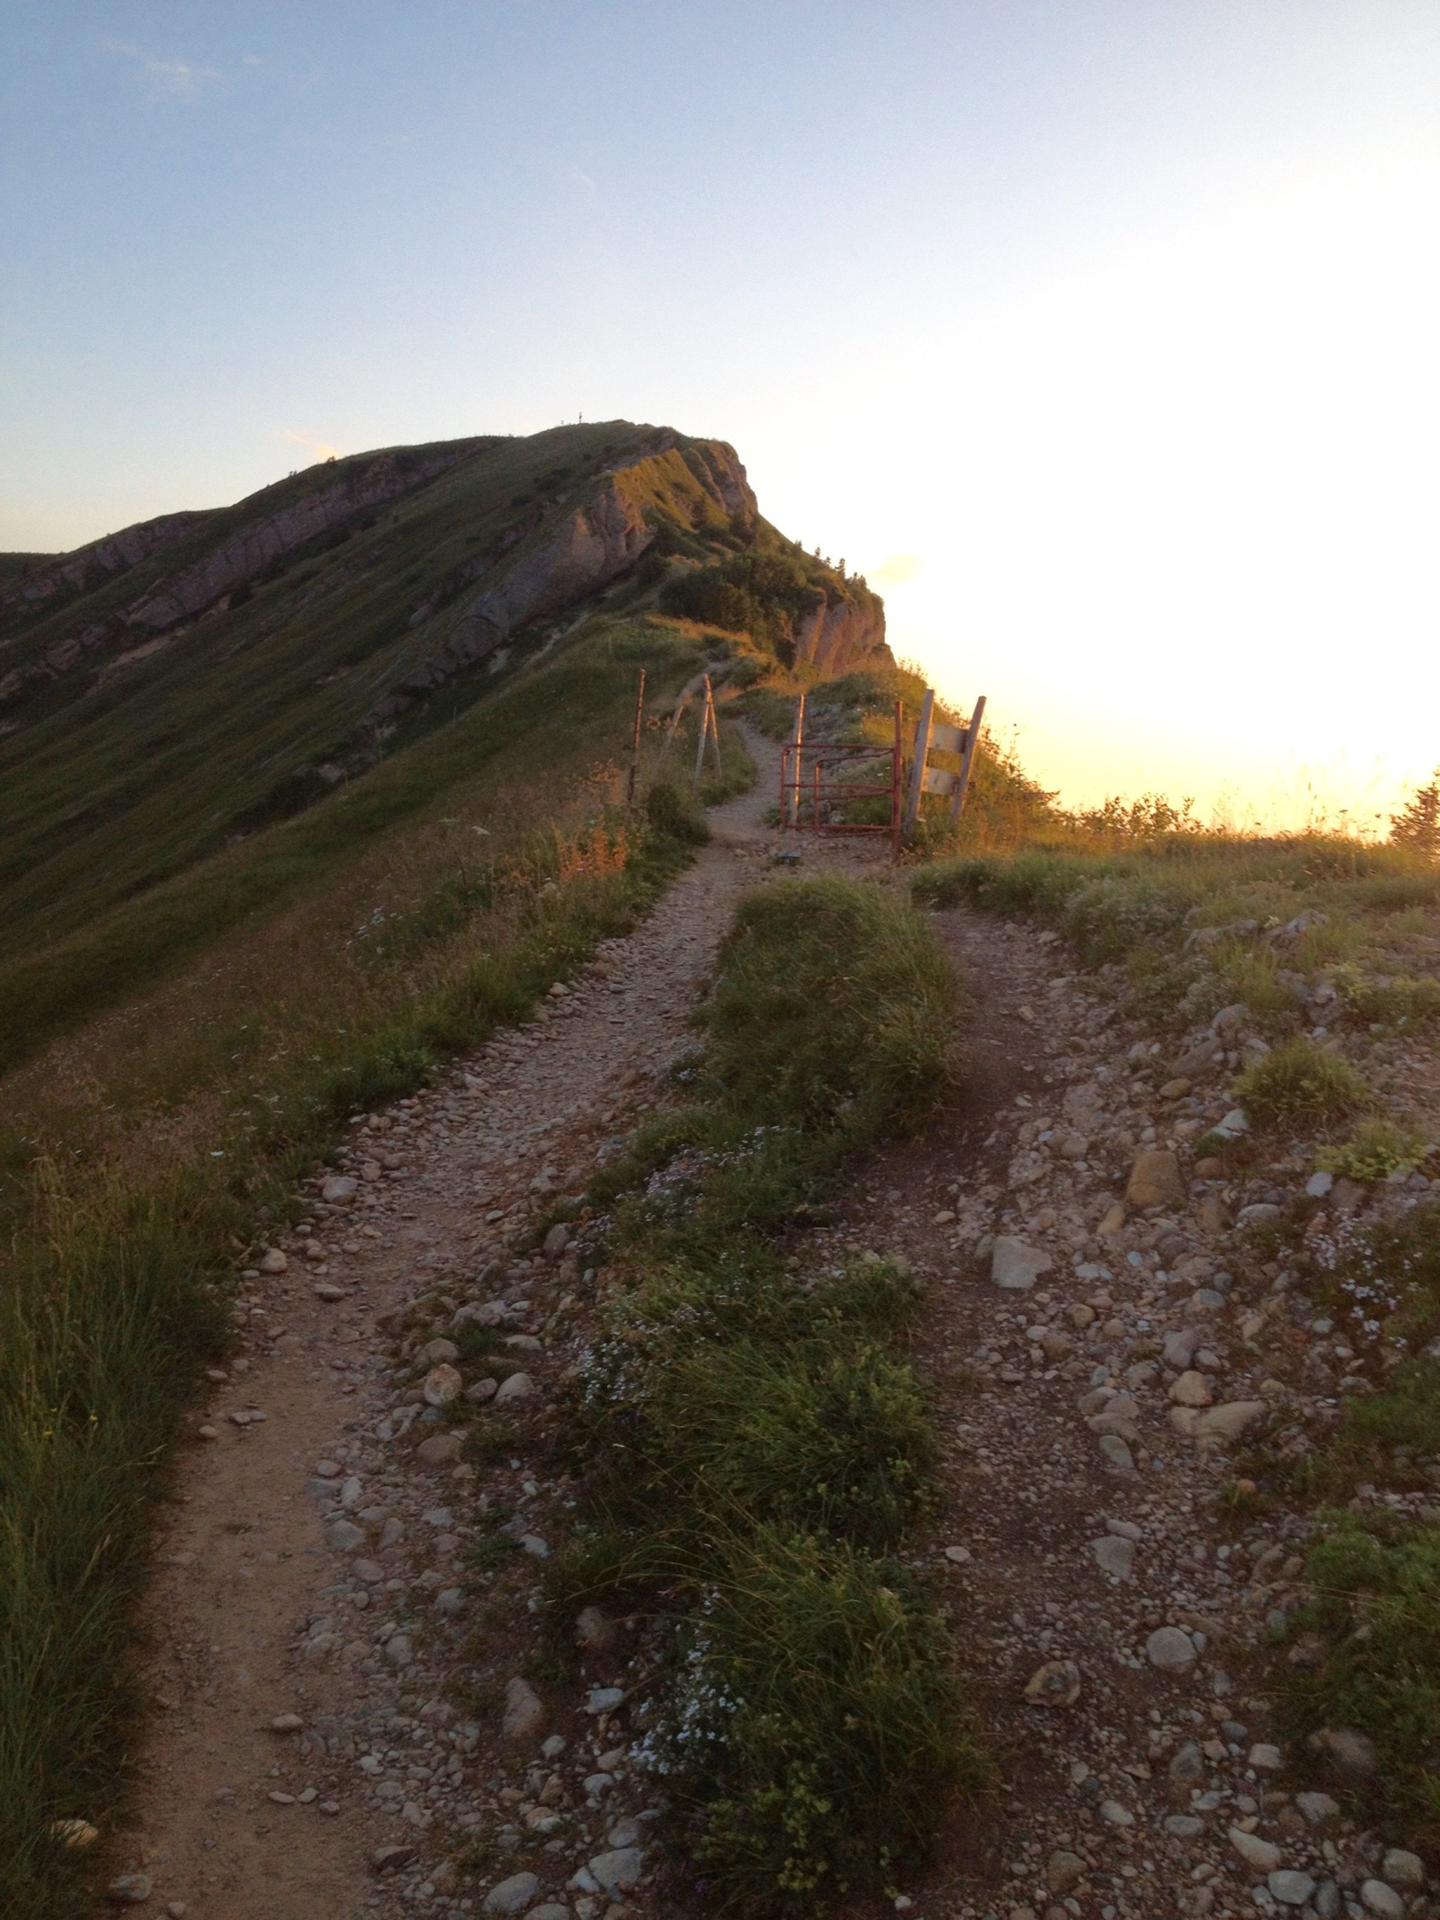 Der Weg folgt dem Grat bis zum Gipfel